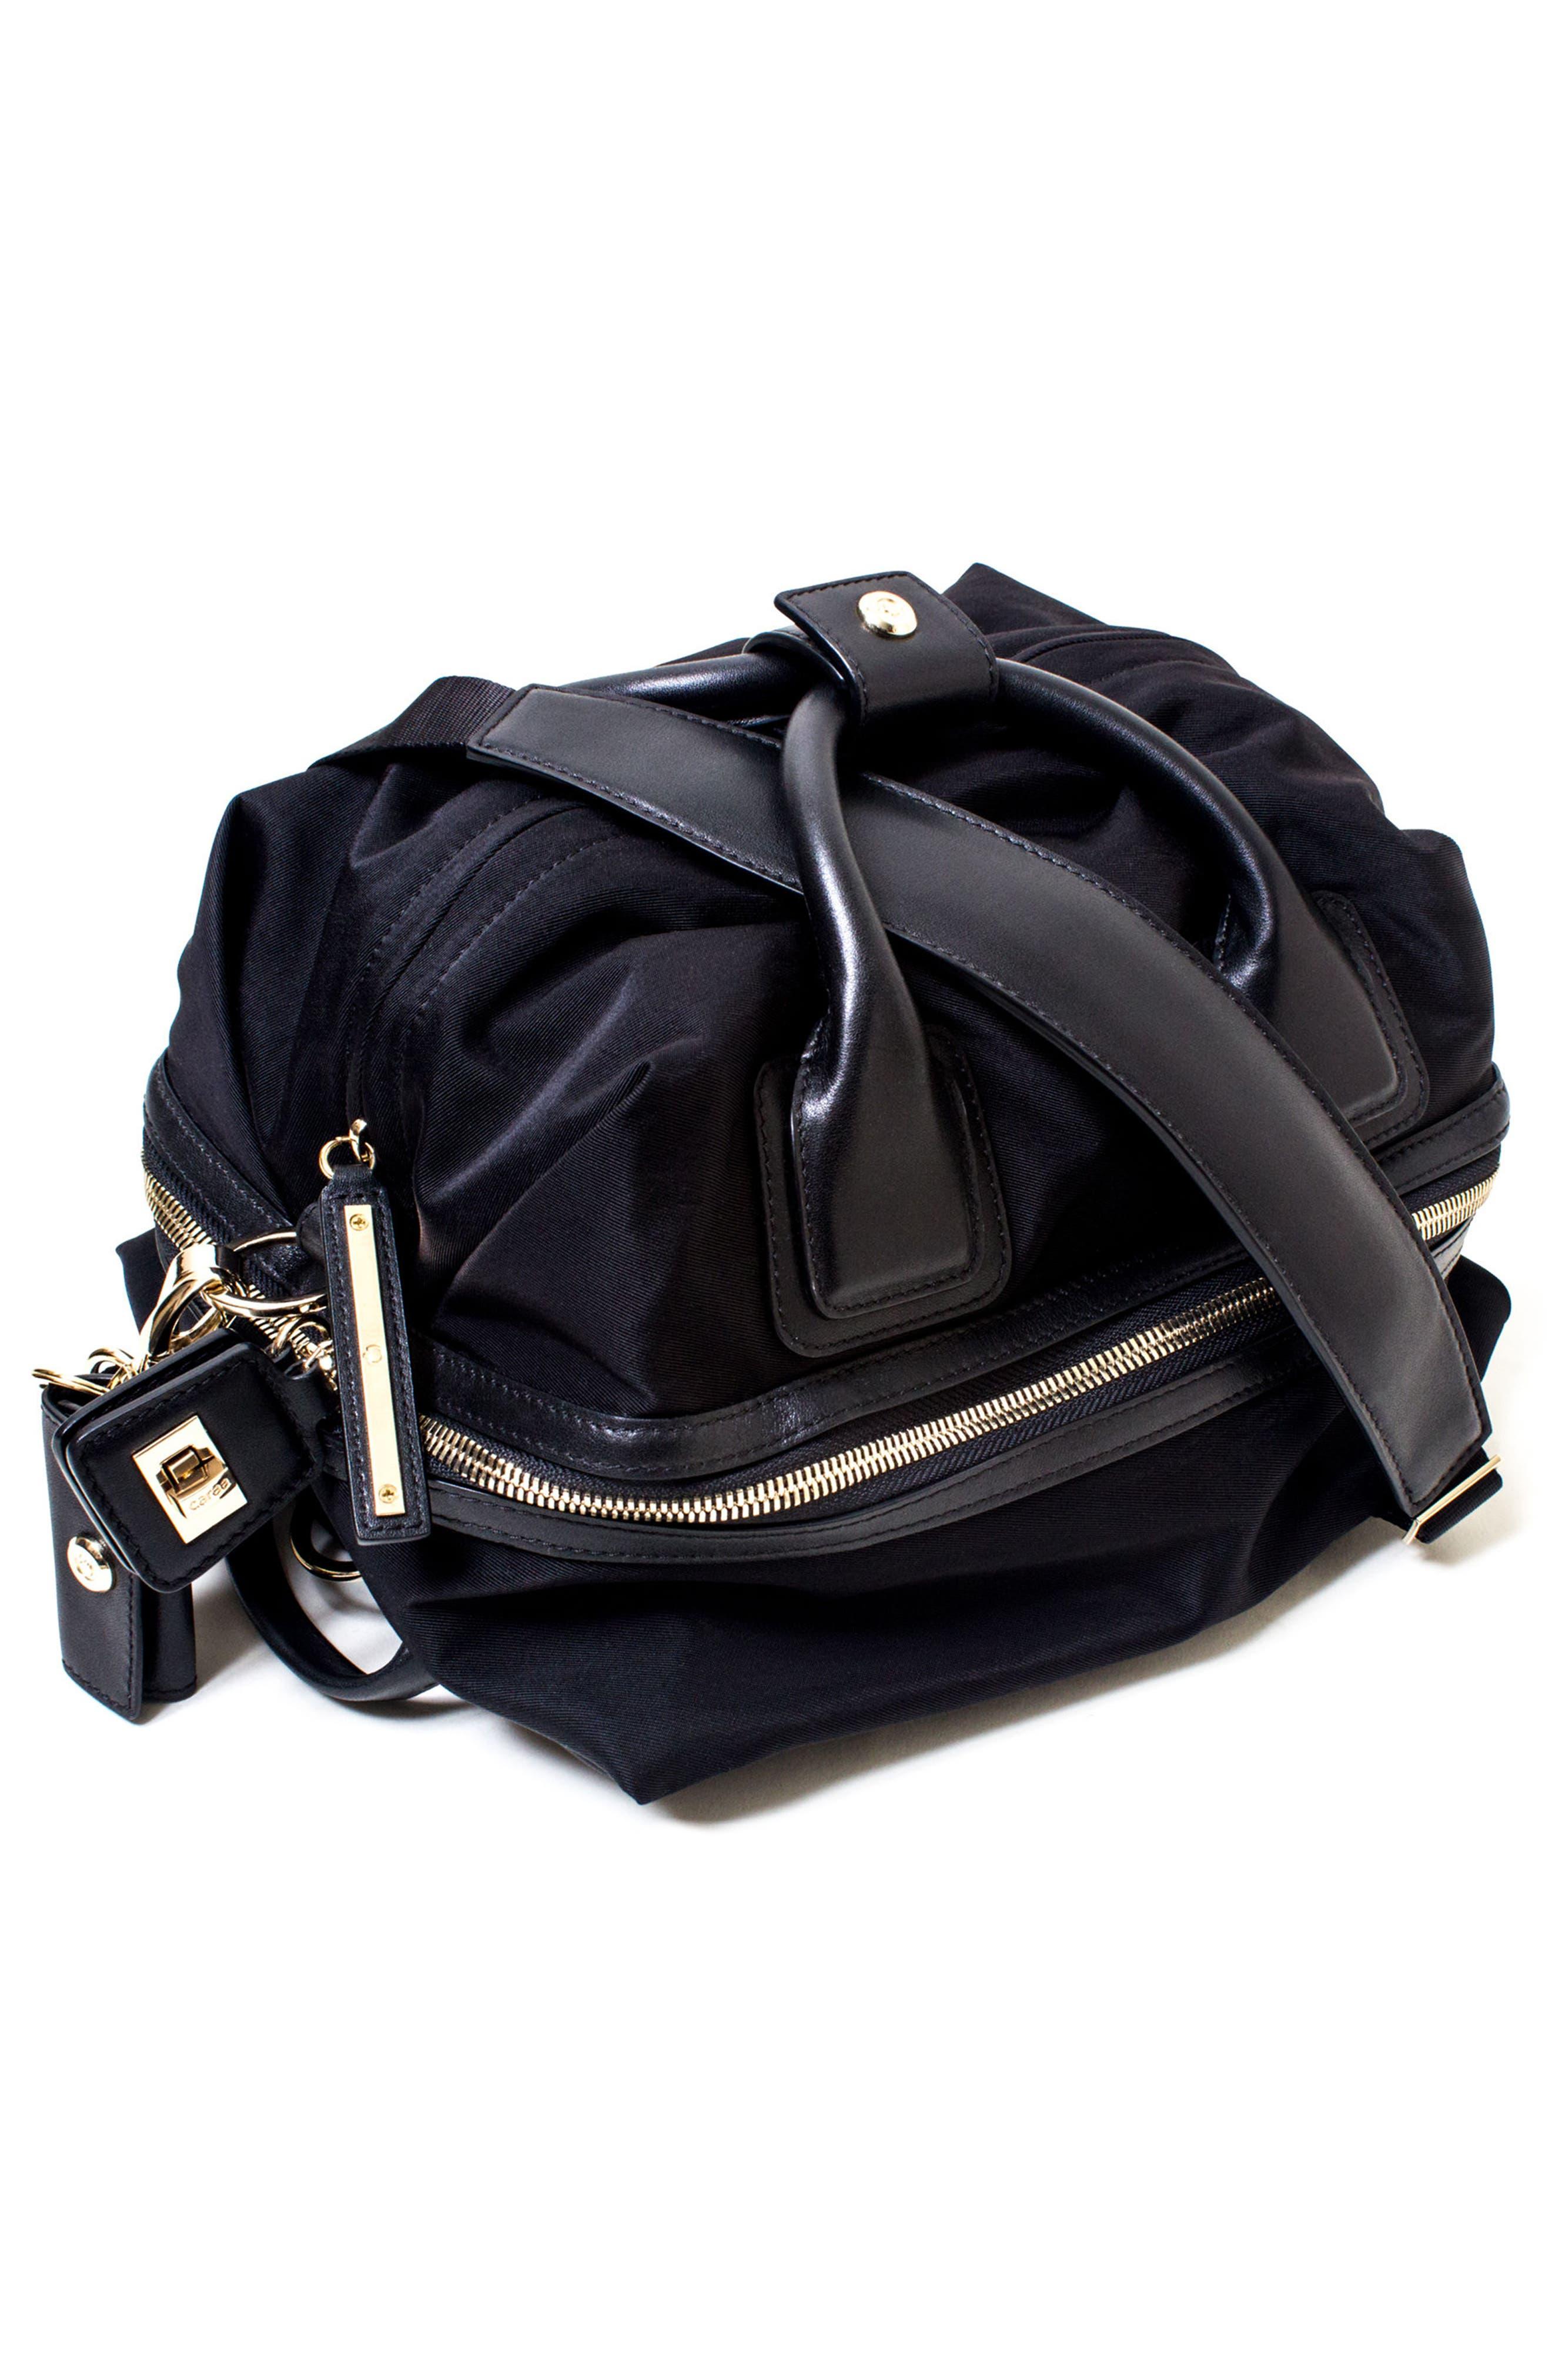 Studio Duffel Backpack,                             Alternate thumbnail 6, color,                             BLACK/ GOLD